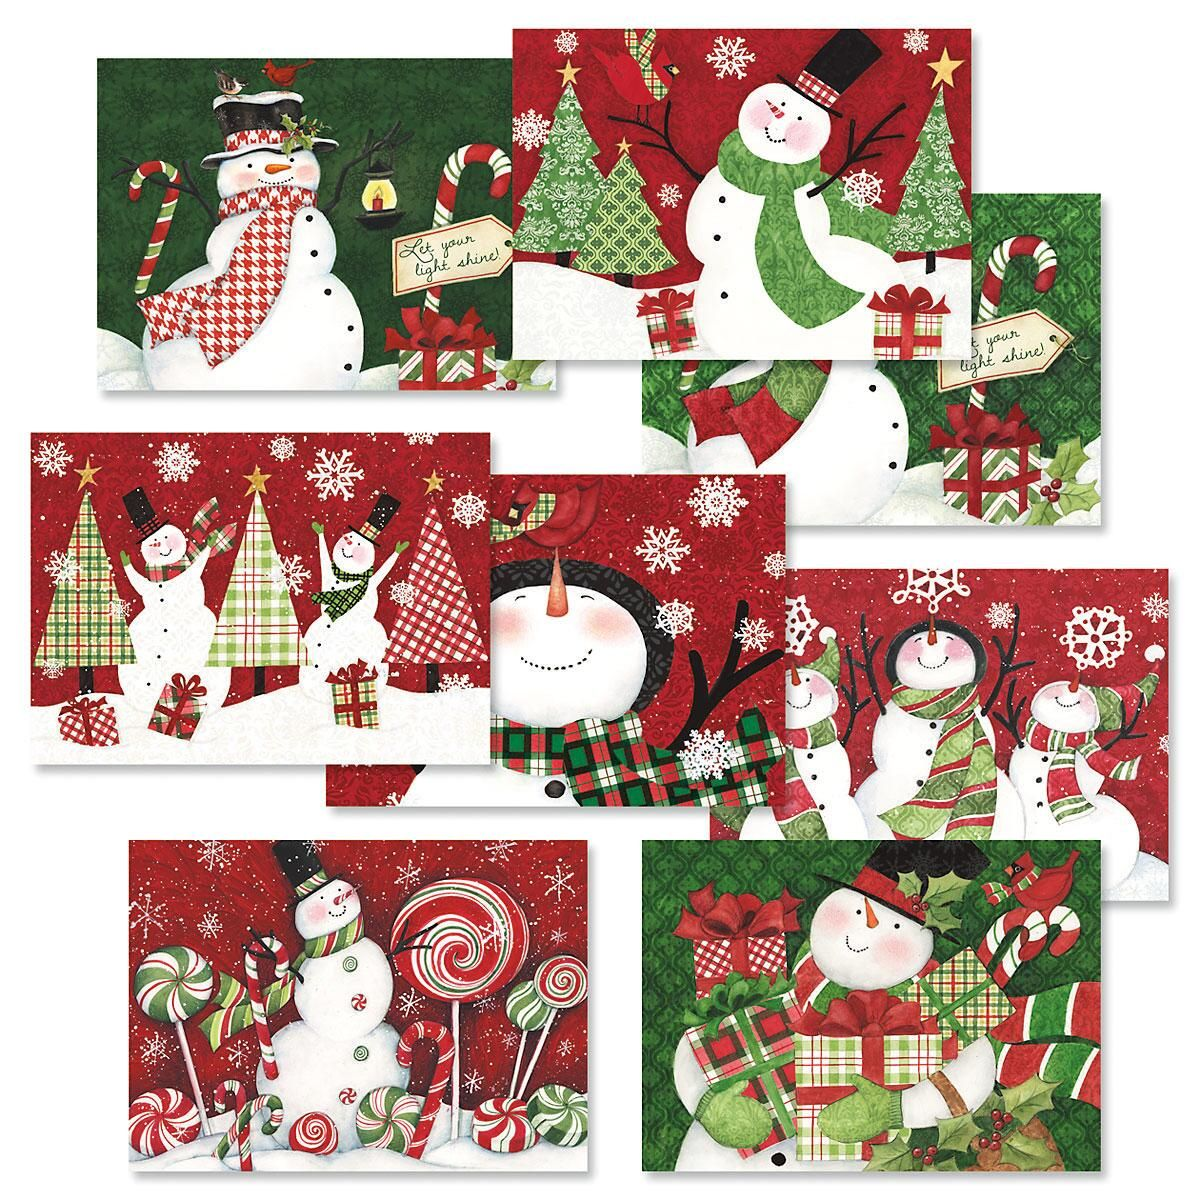 Snowman Christmas Cards Value Pack Christmas Card Value